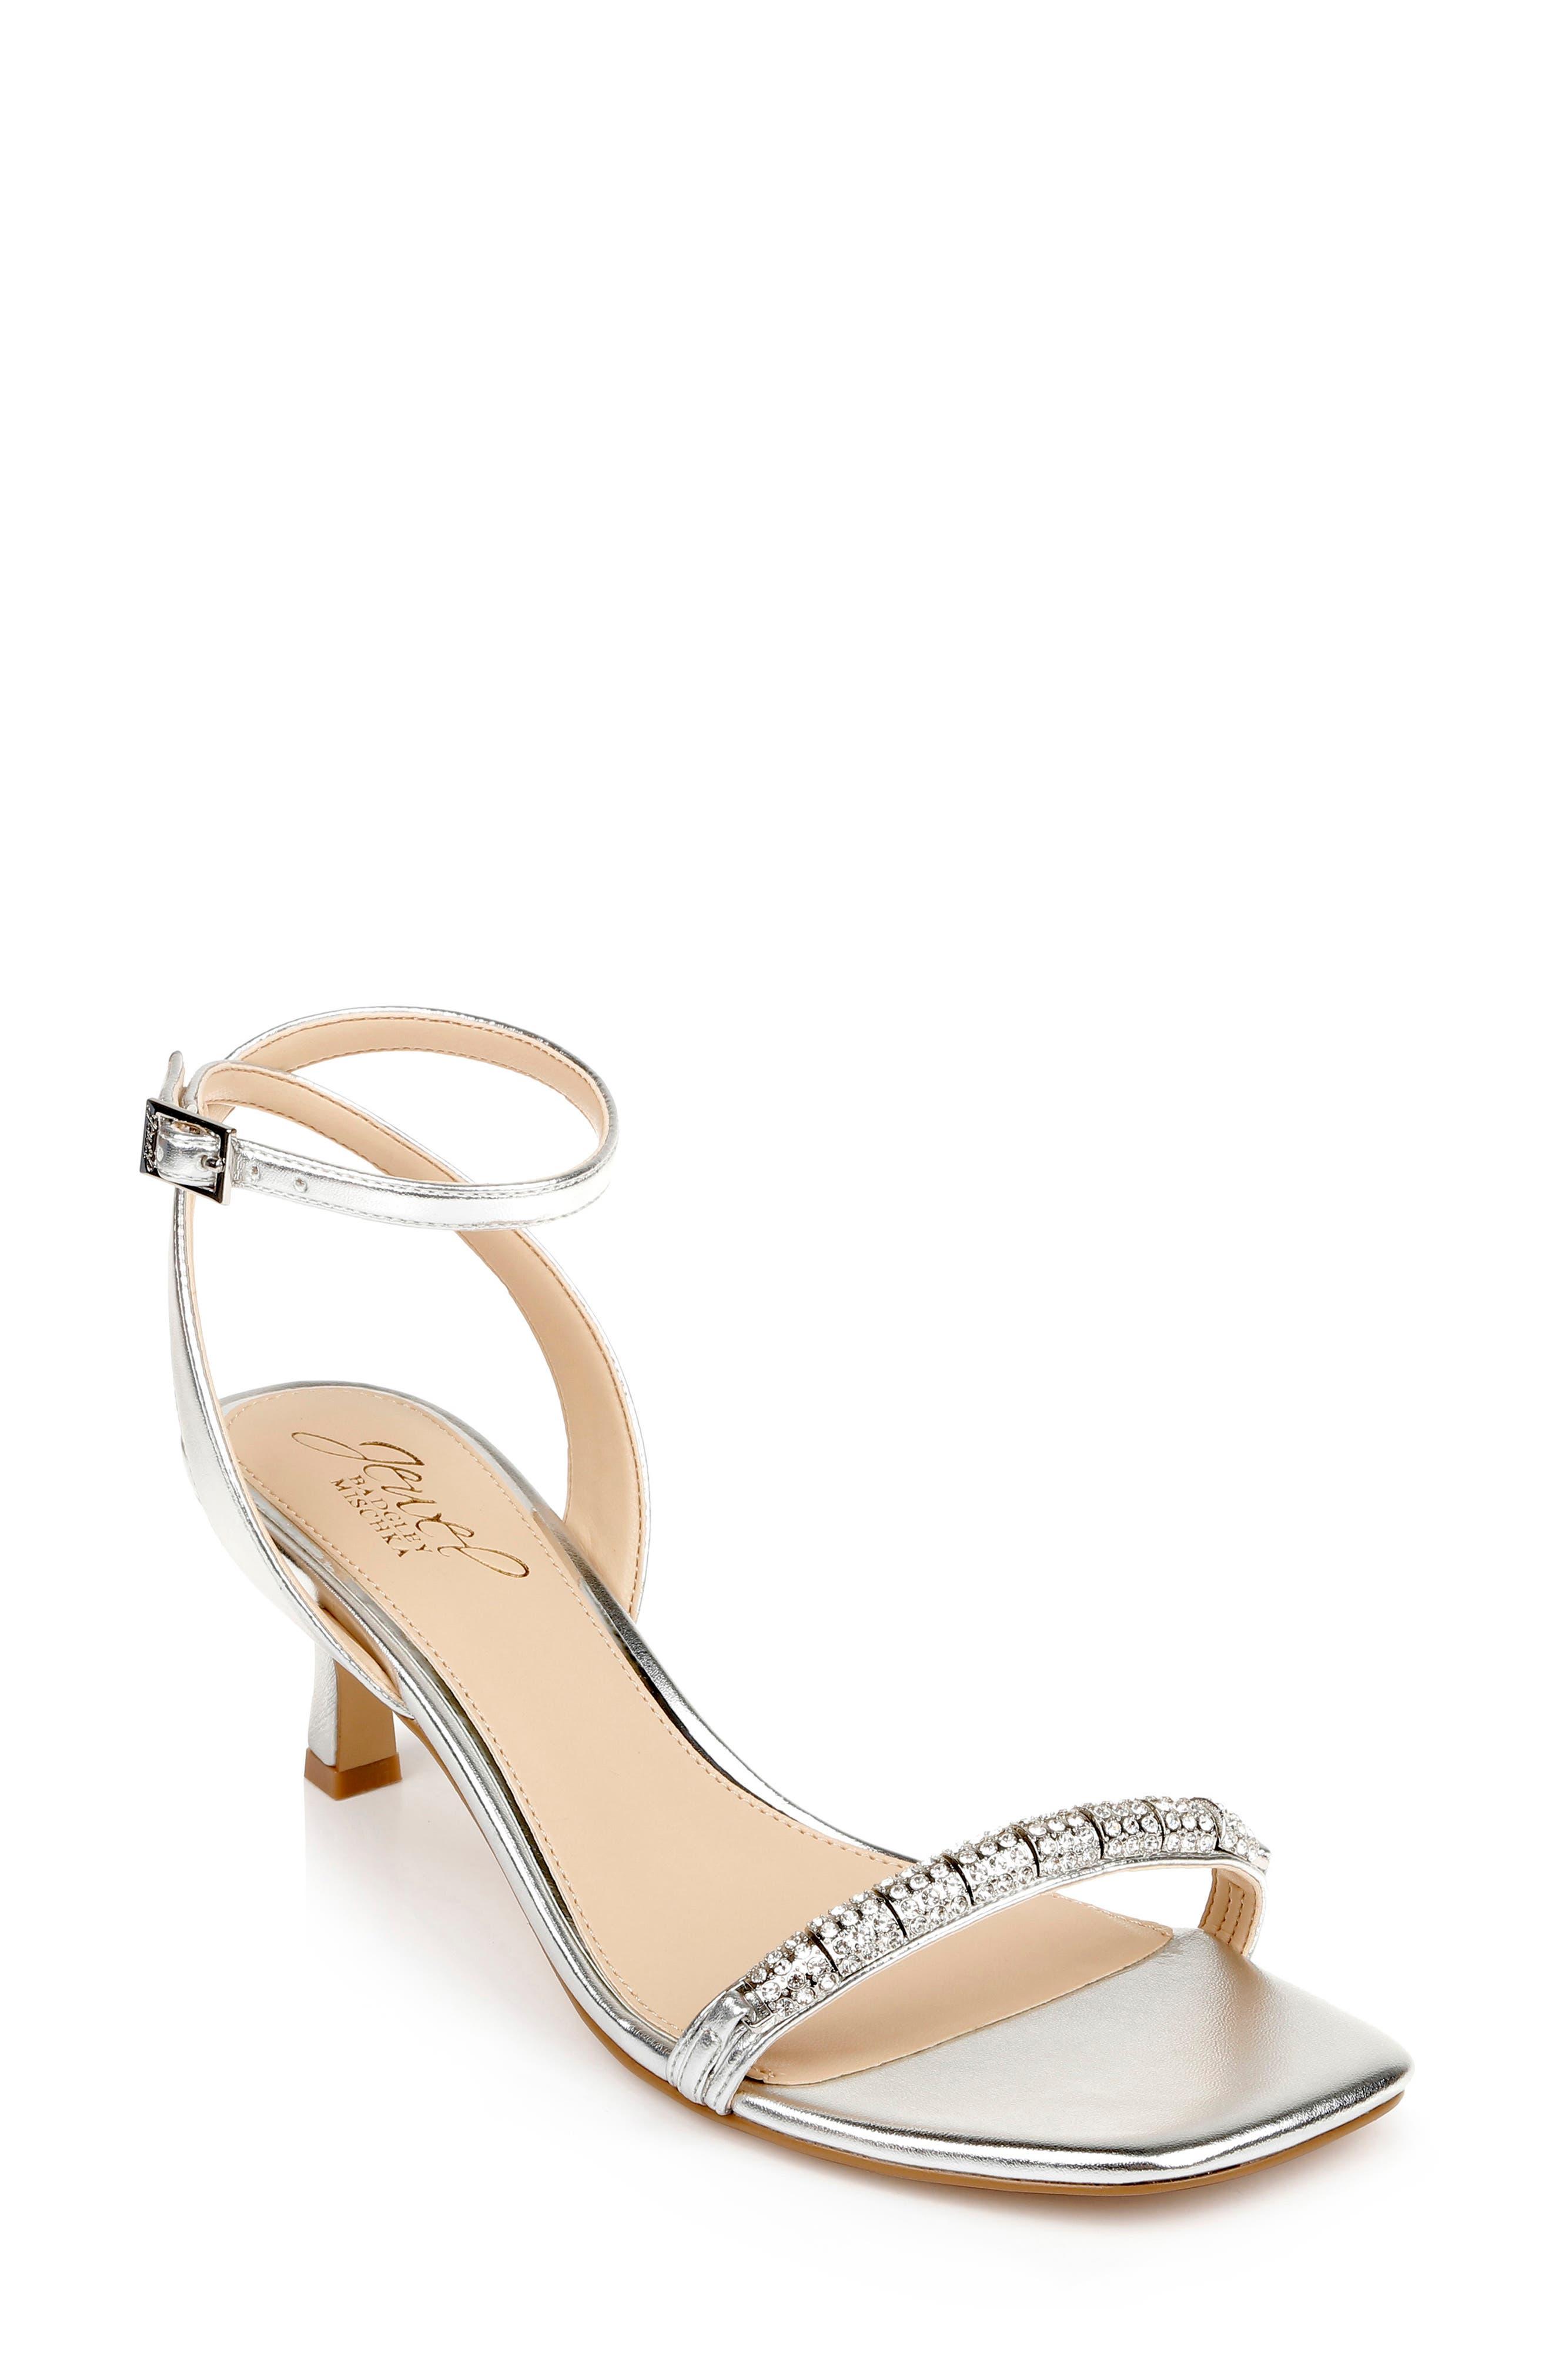 Charisma Ankle Strap Sandal